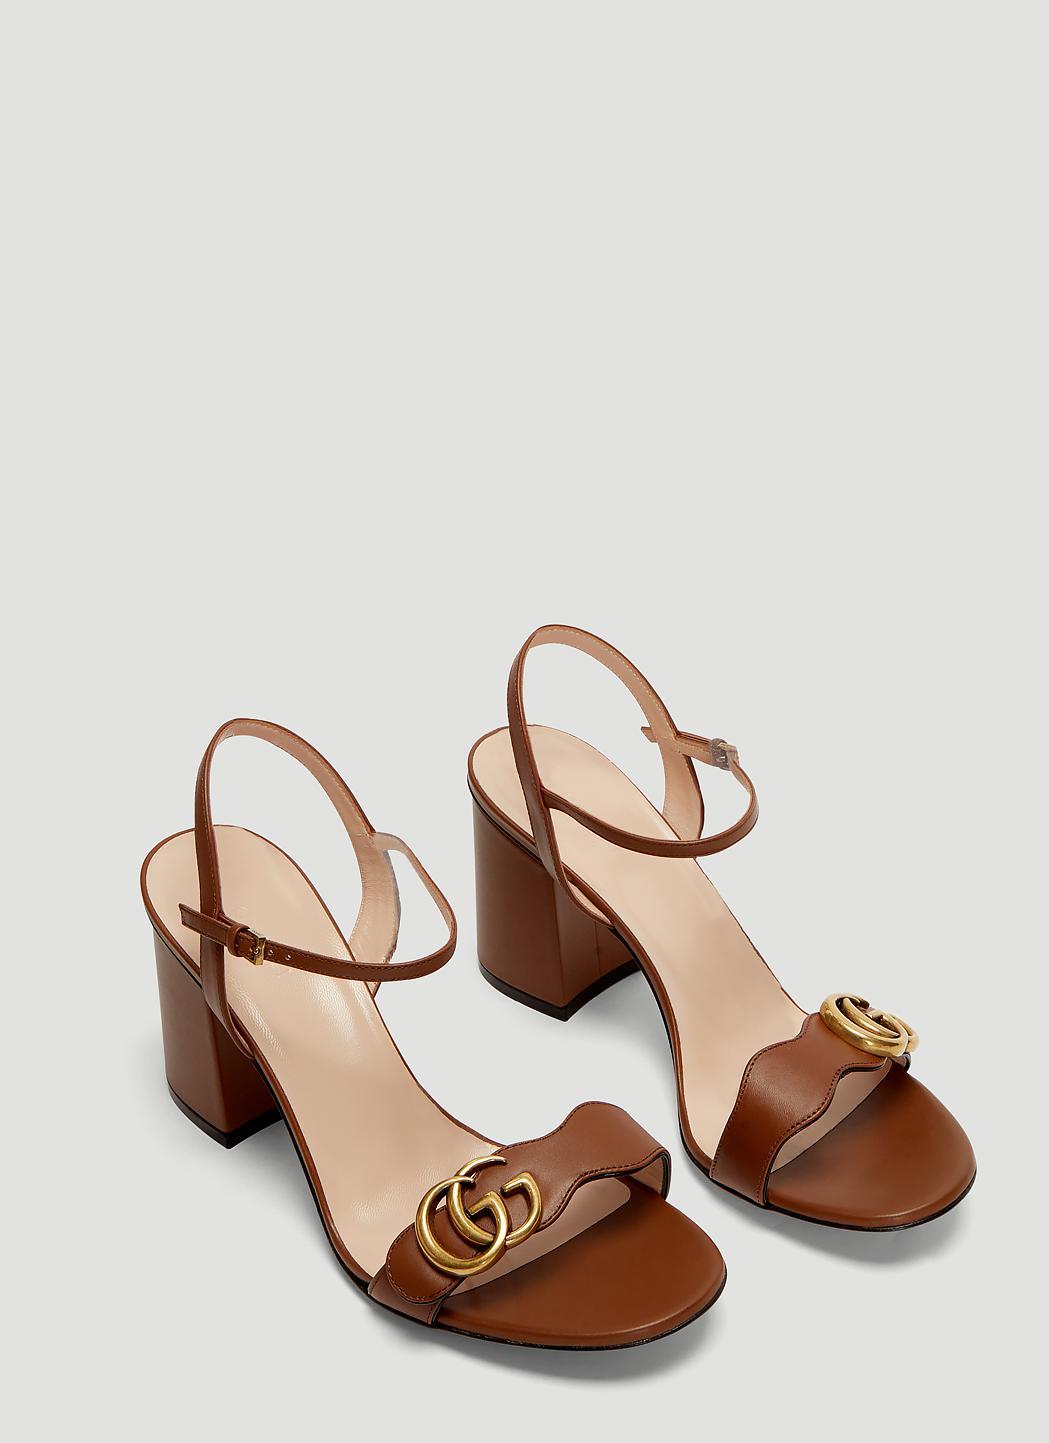 bb26ba9d1d9 Gucci - GG 75 Marmont Sandals In Brown - Lyst. View fullscreen